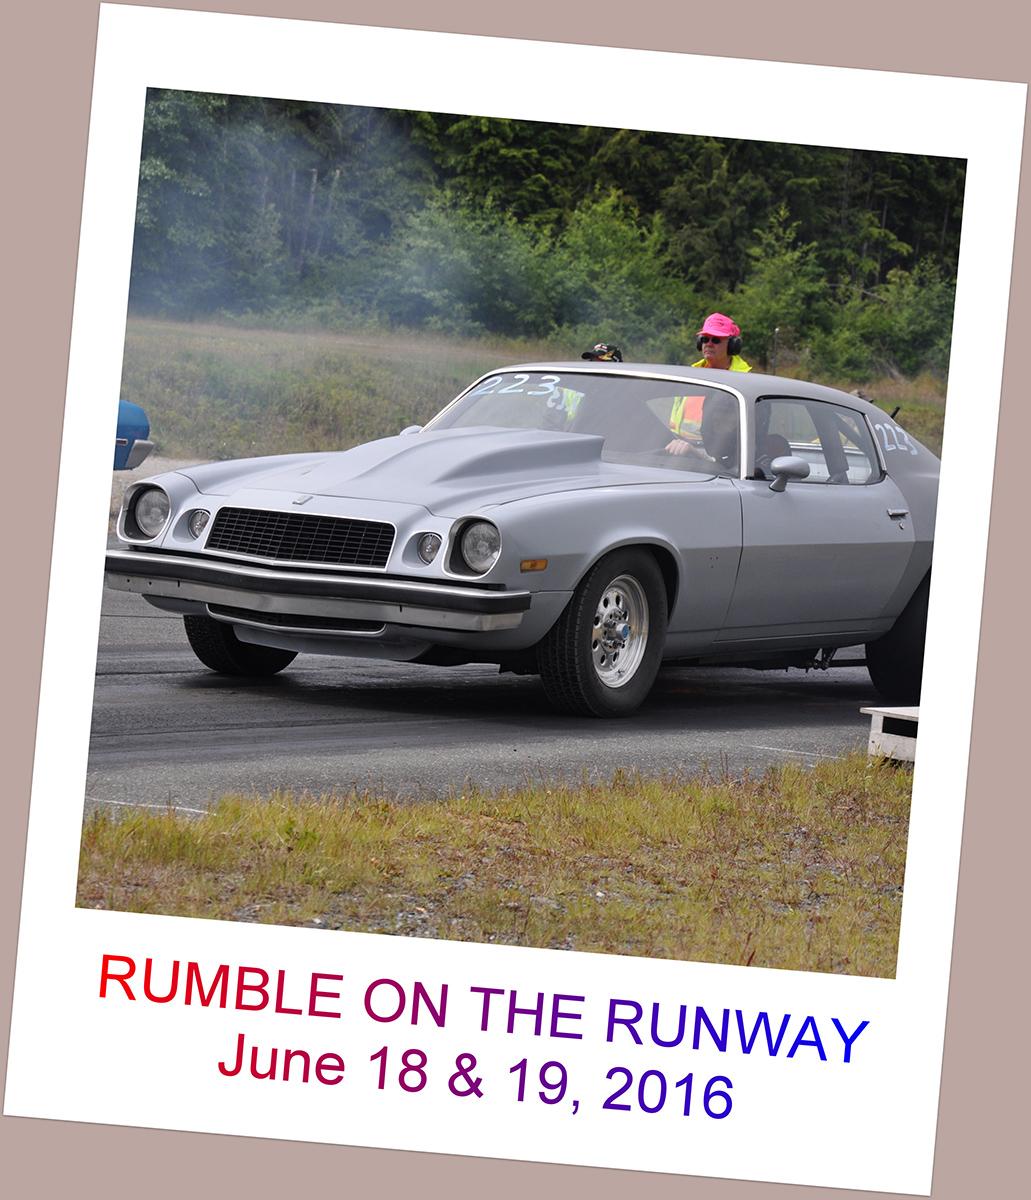 Rumble on the Runway June 18 & 19, 2016 1291